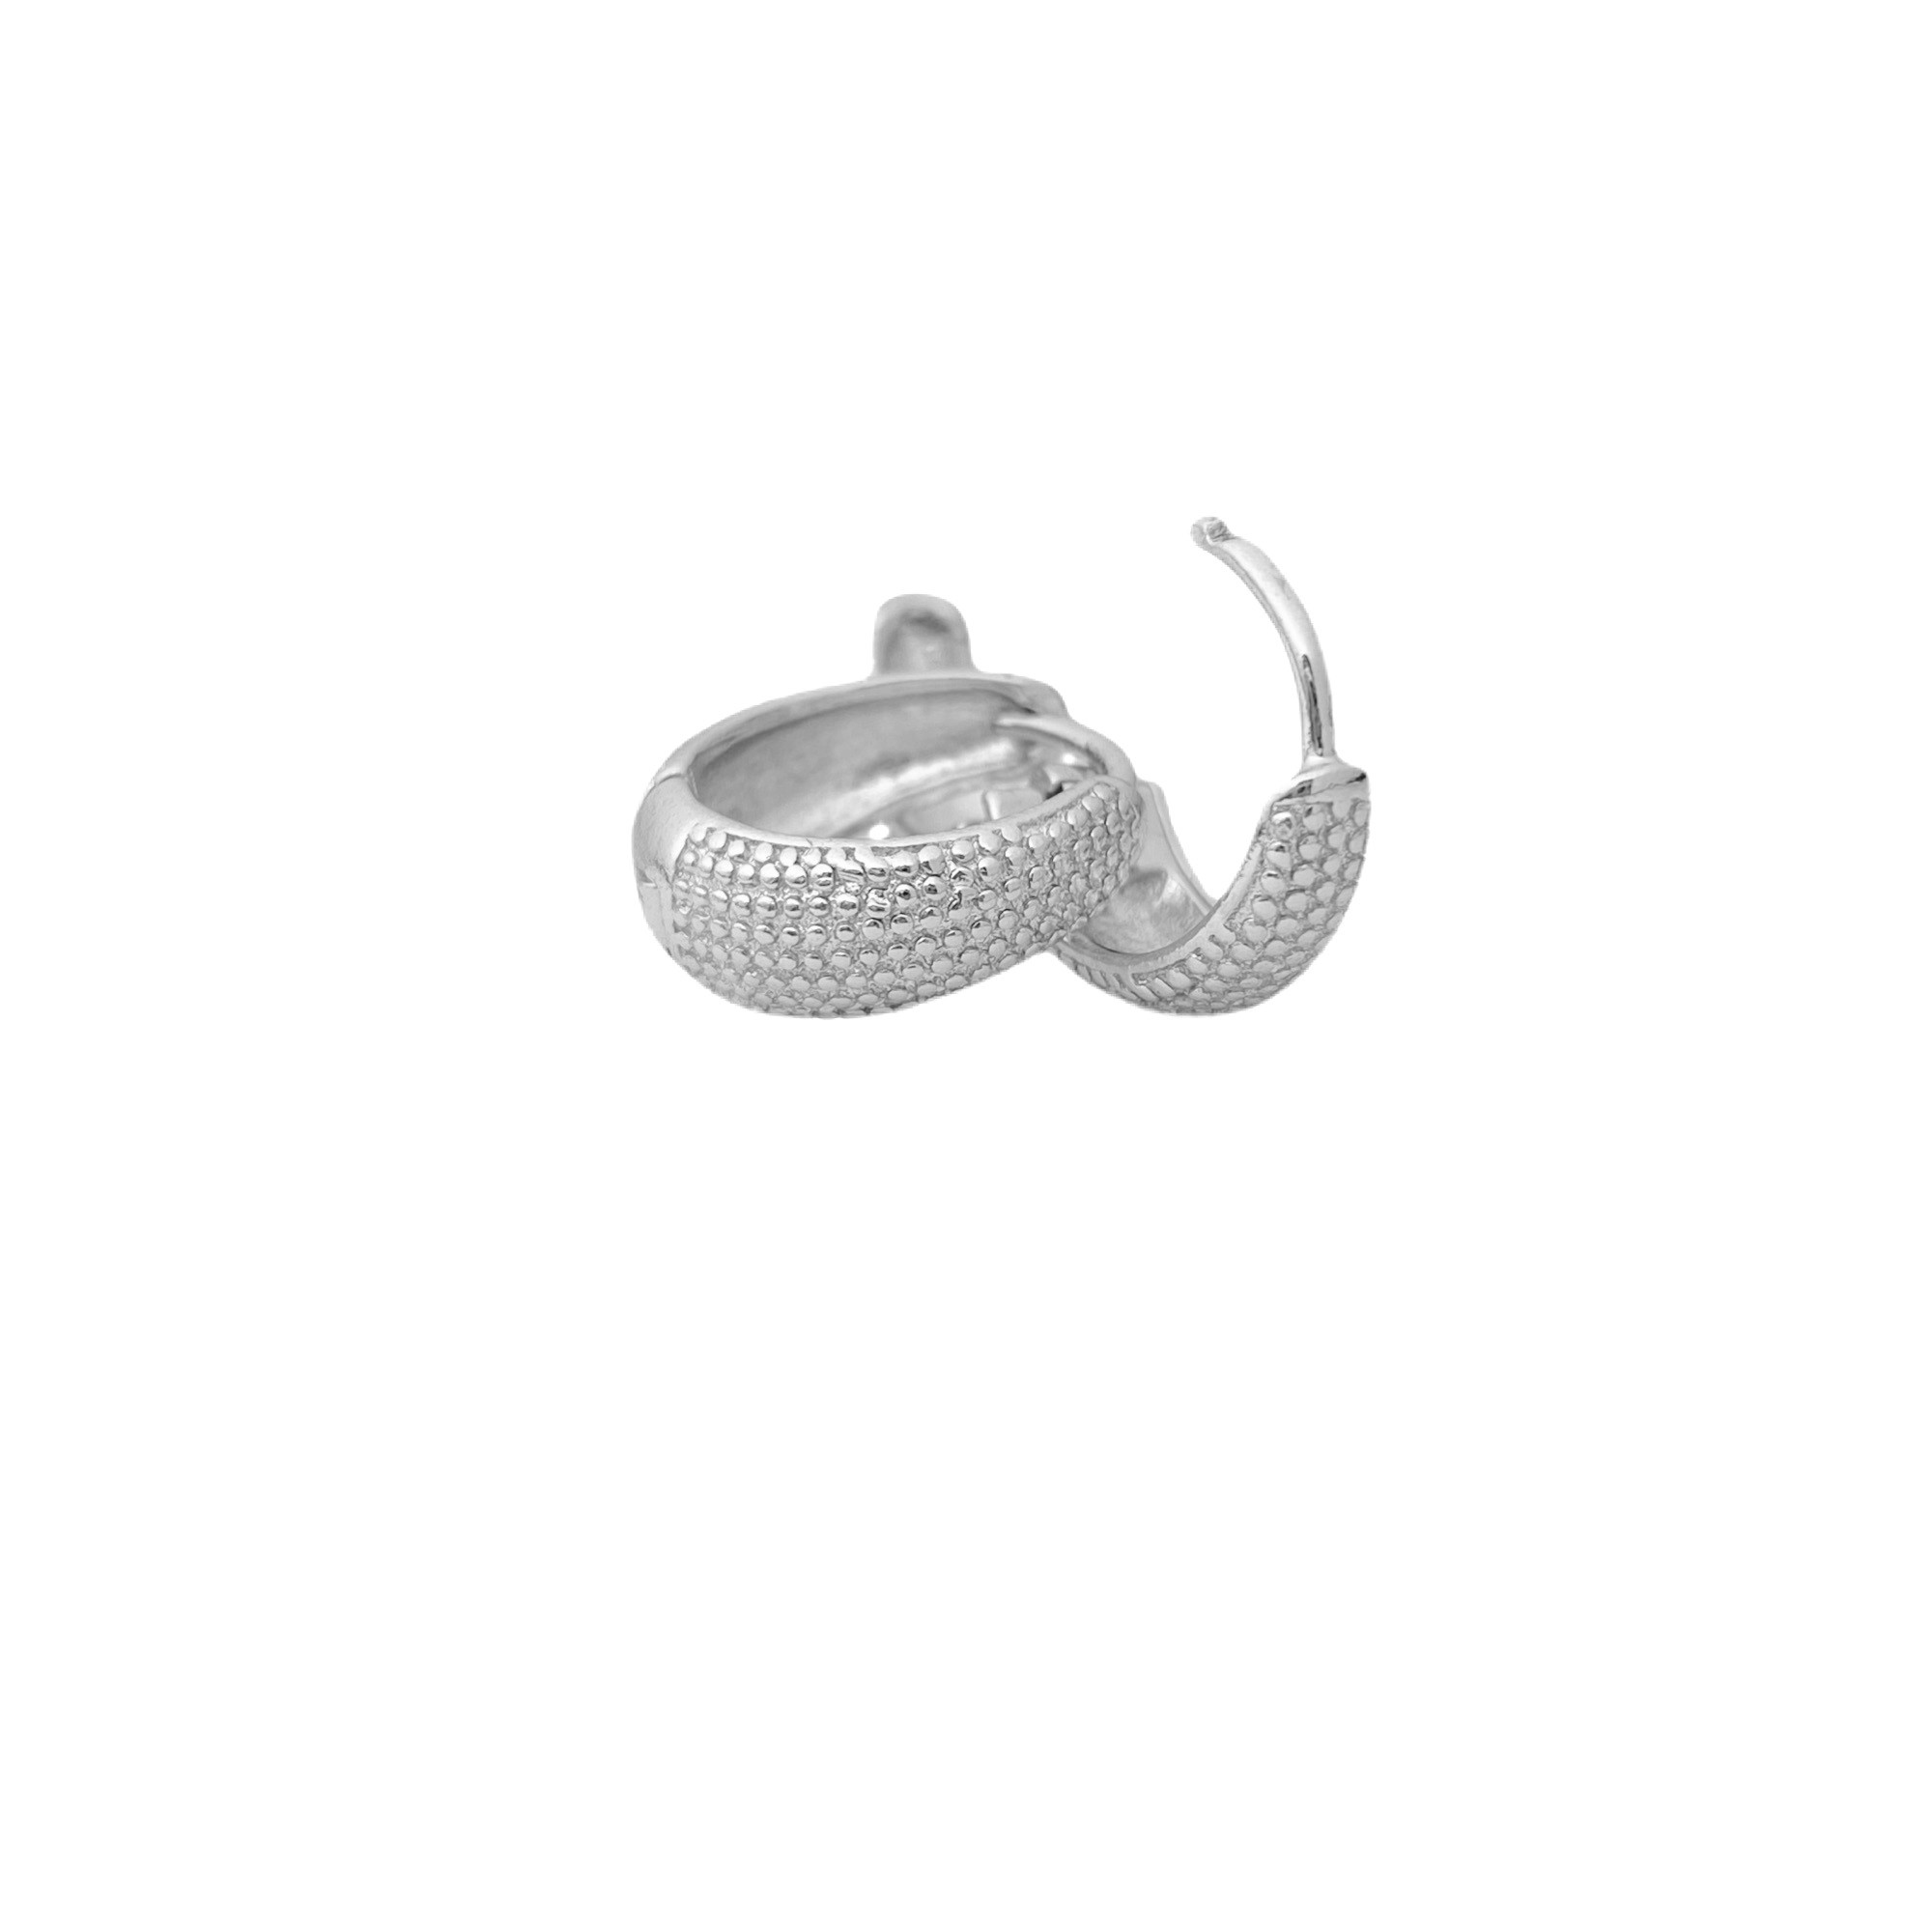 Brinco Argola Texturizado P (Banho Prata 925) (Piercing Hélix)